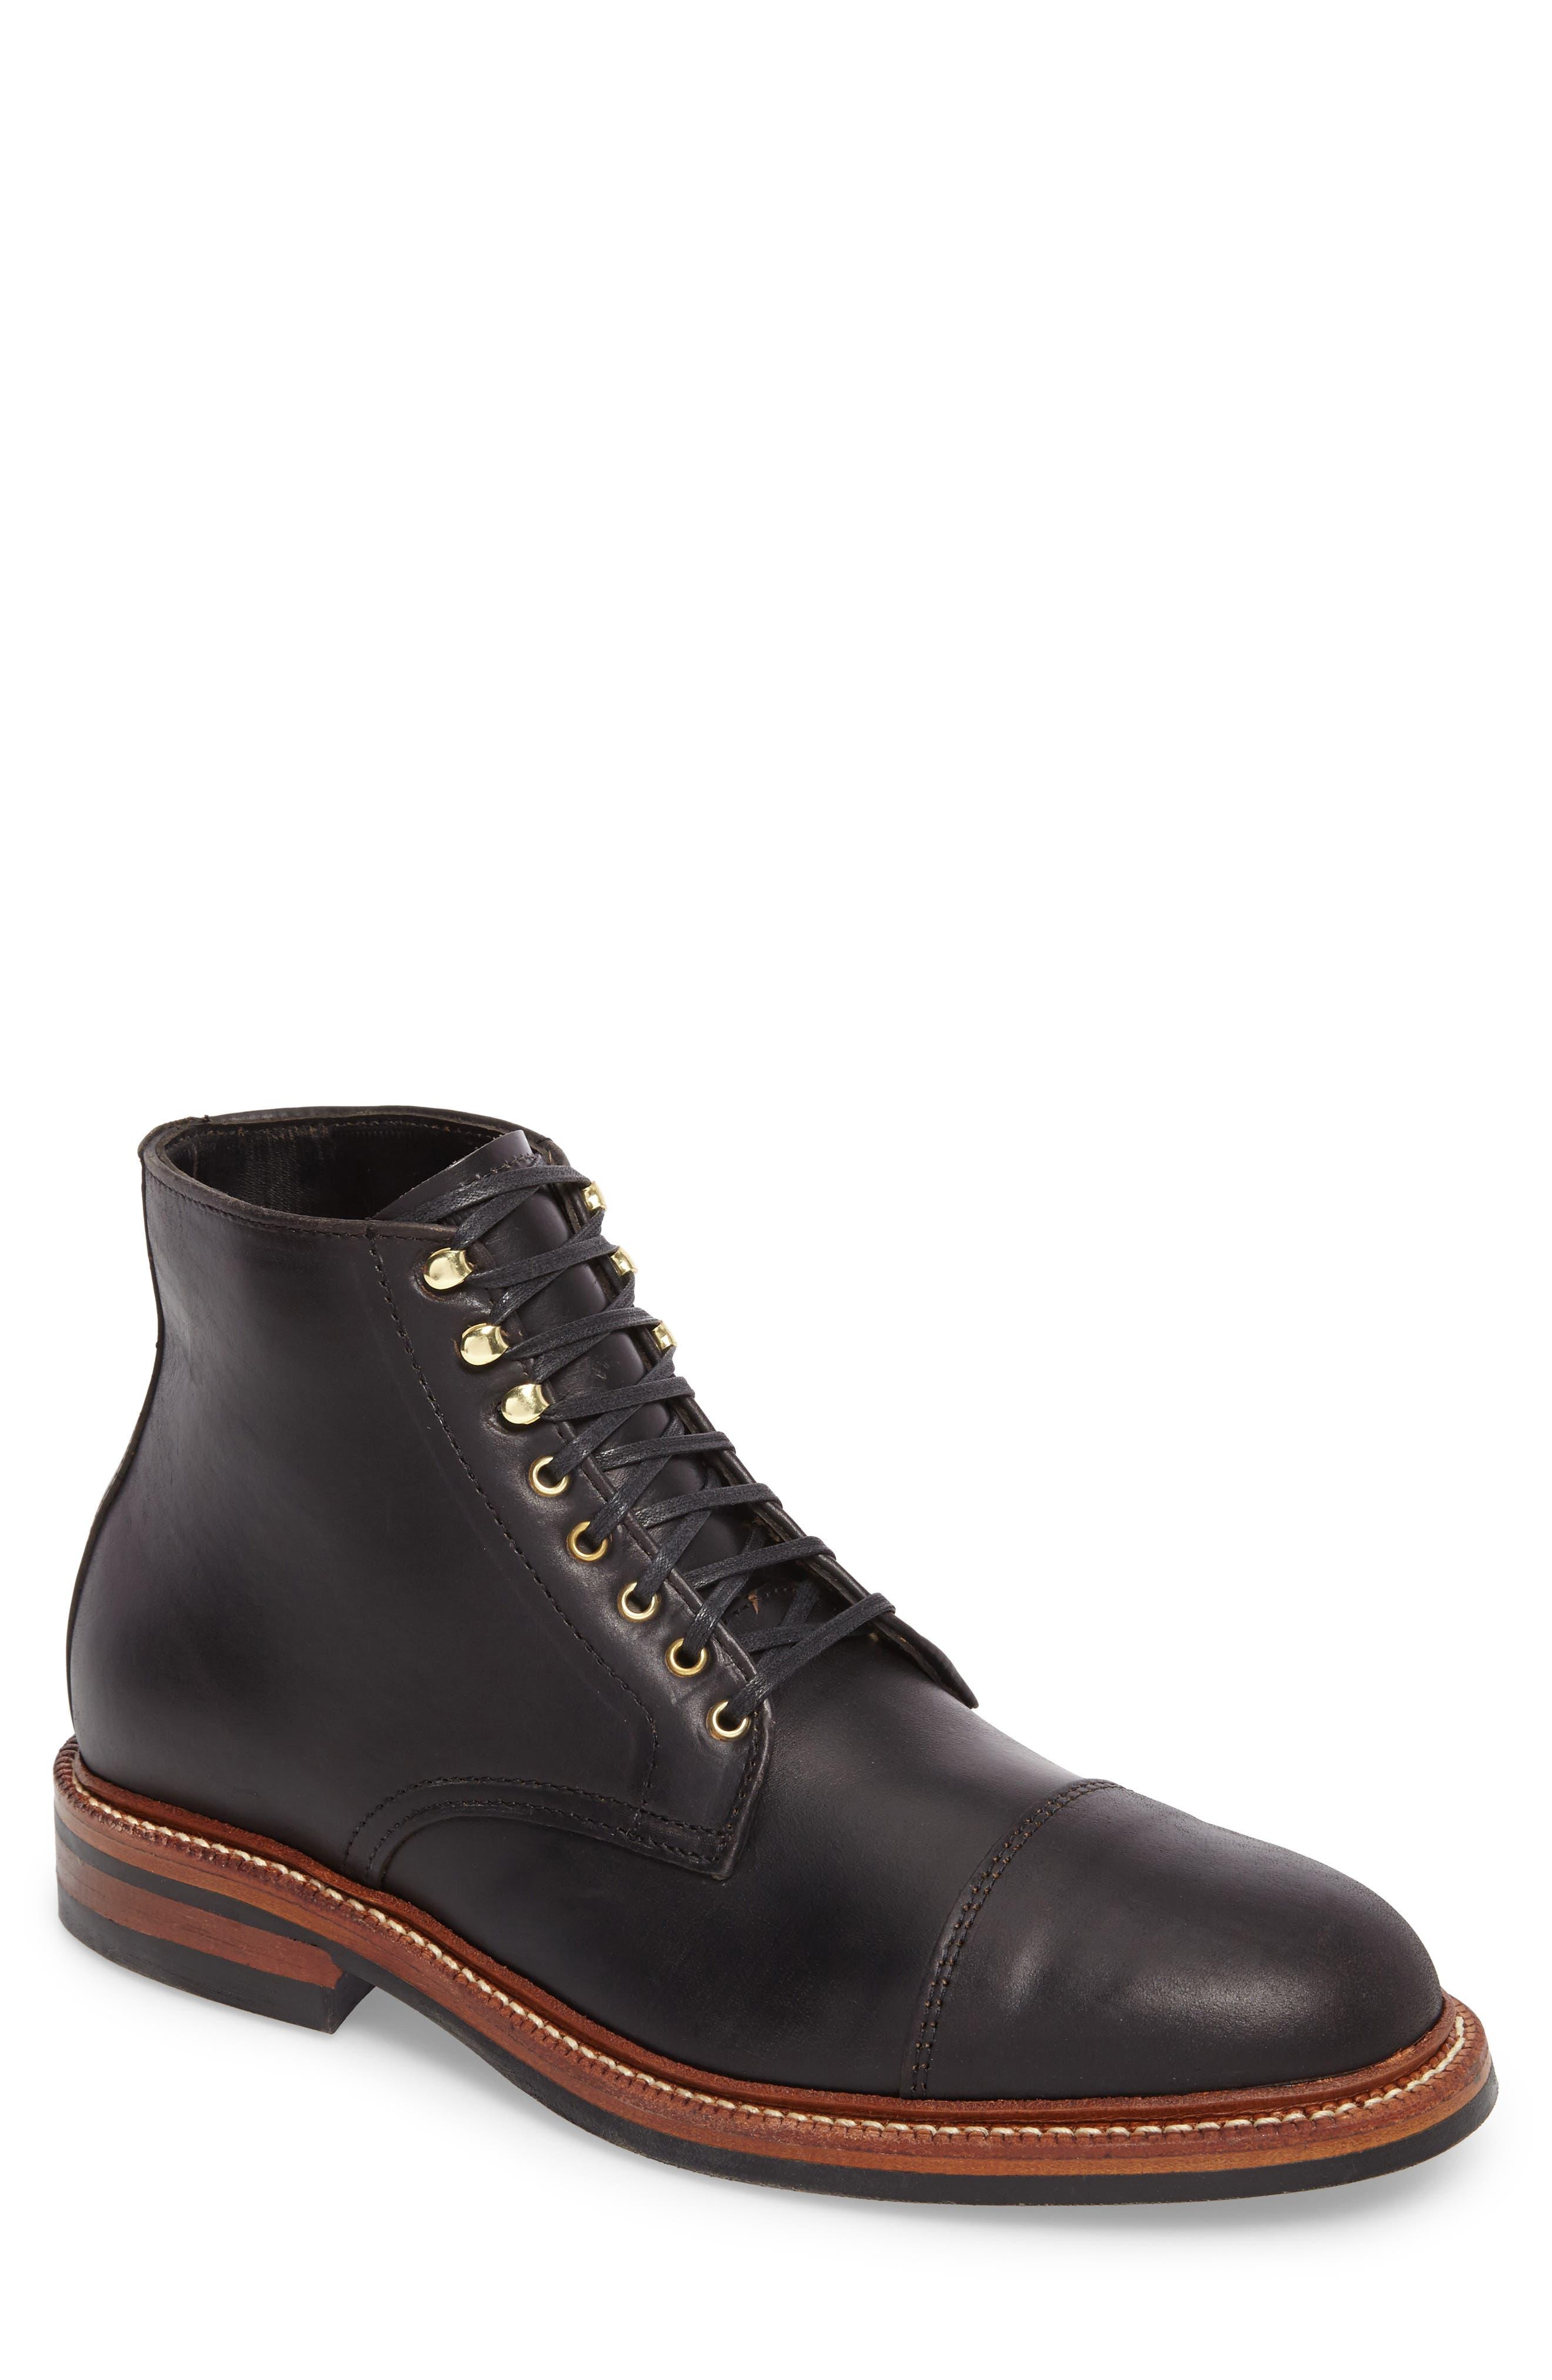 Lakeshore Cap Toe Boot,                         Main,                         color, BLACK LEATHER